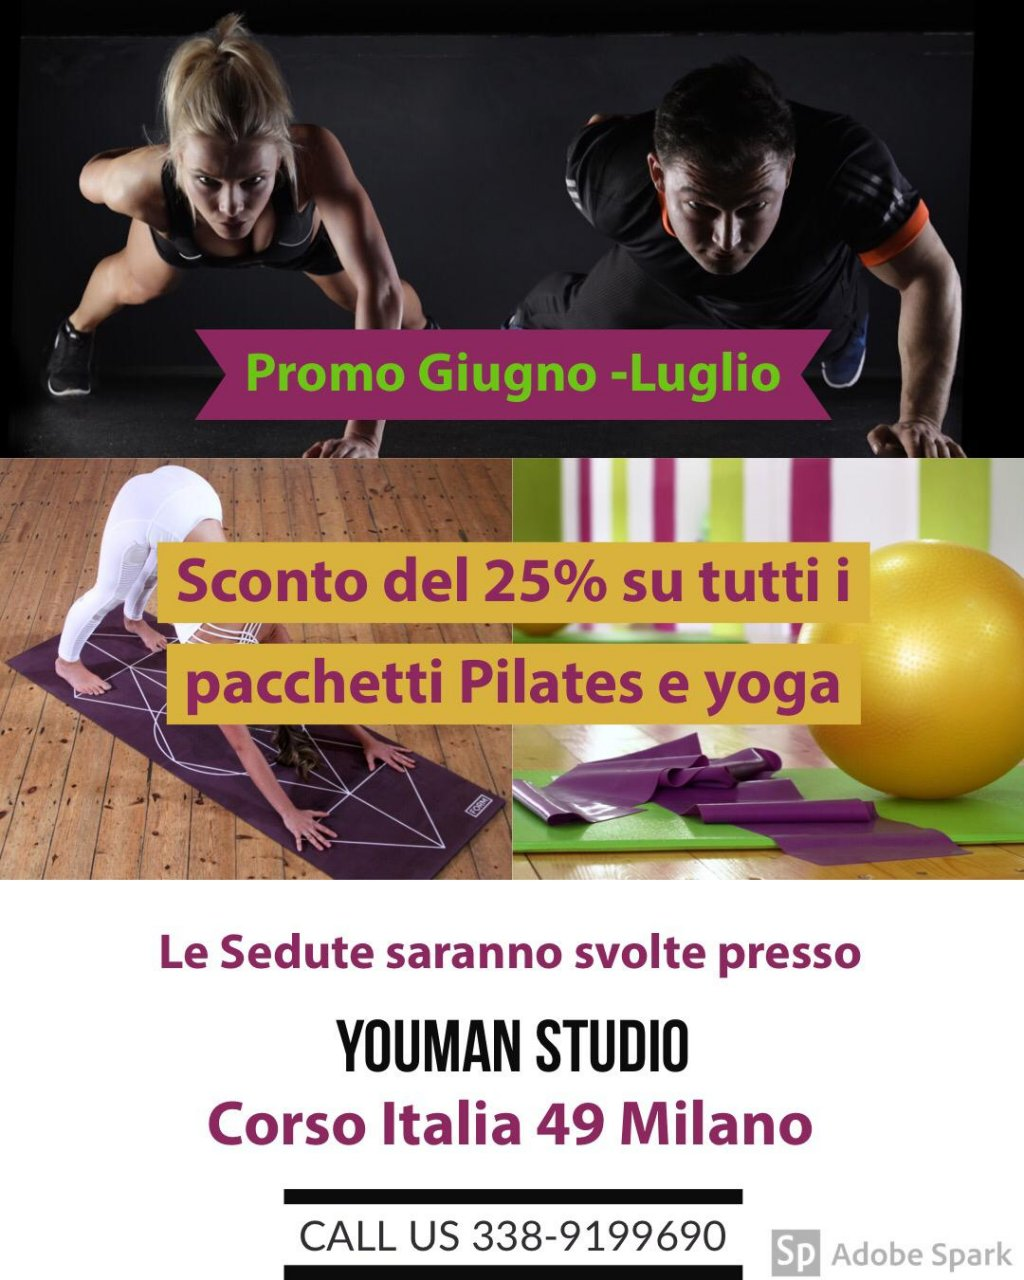 Youman studio 10 lezioni PILATES O YOGA